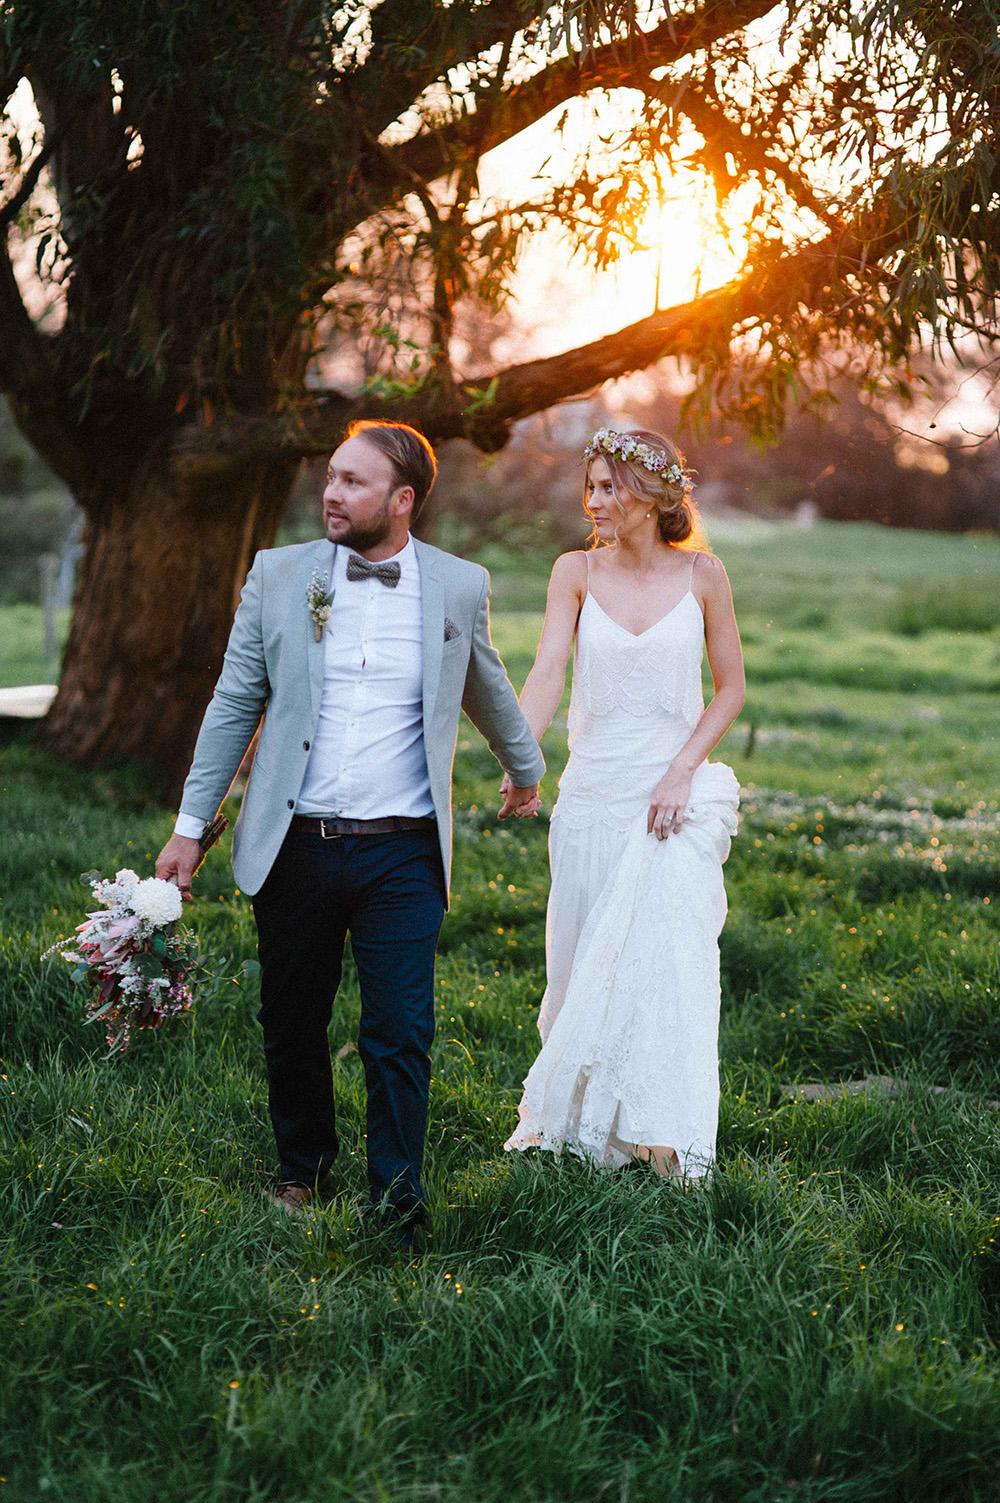 68-margaret river wedding photography romantic boho rustic sunset.jpg